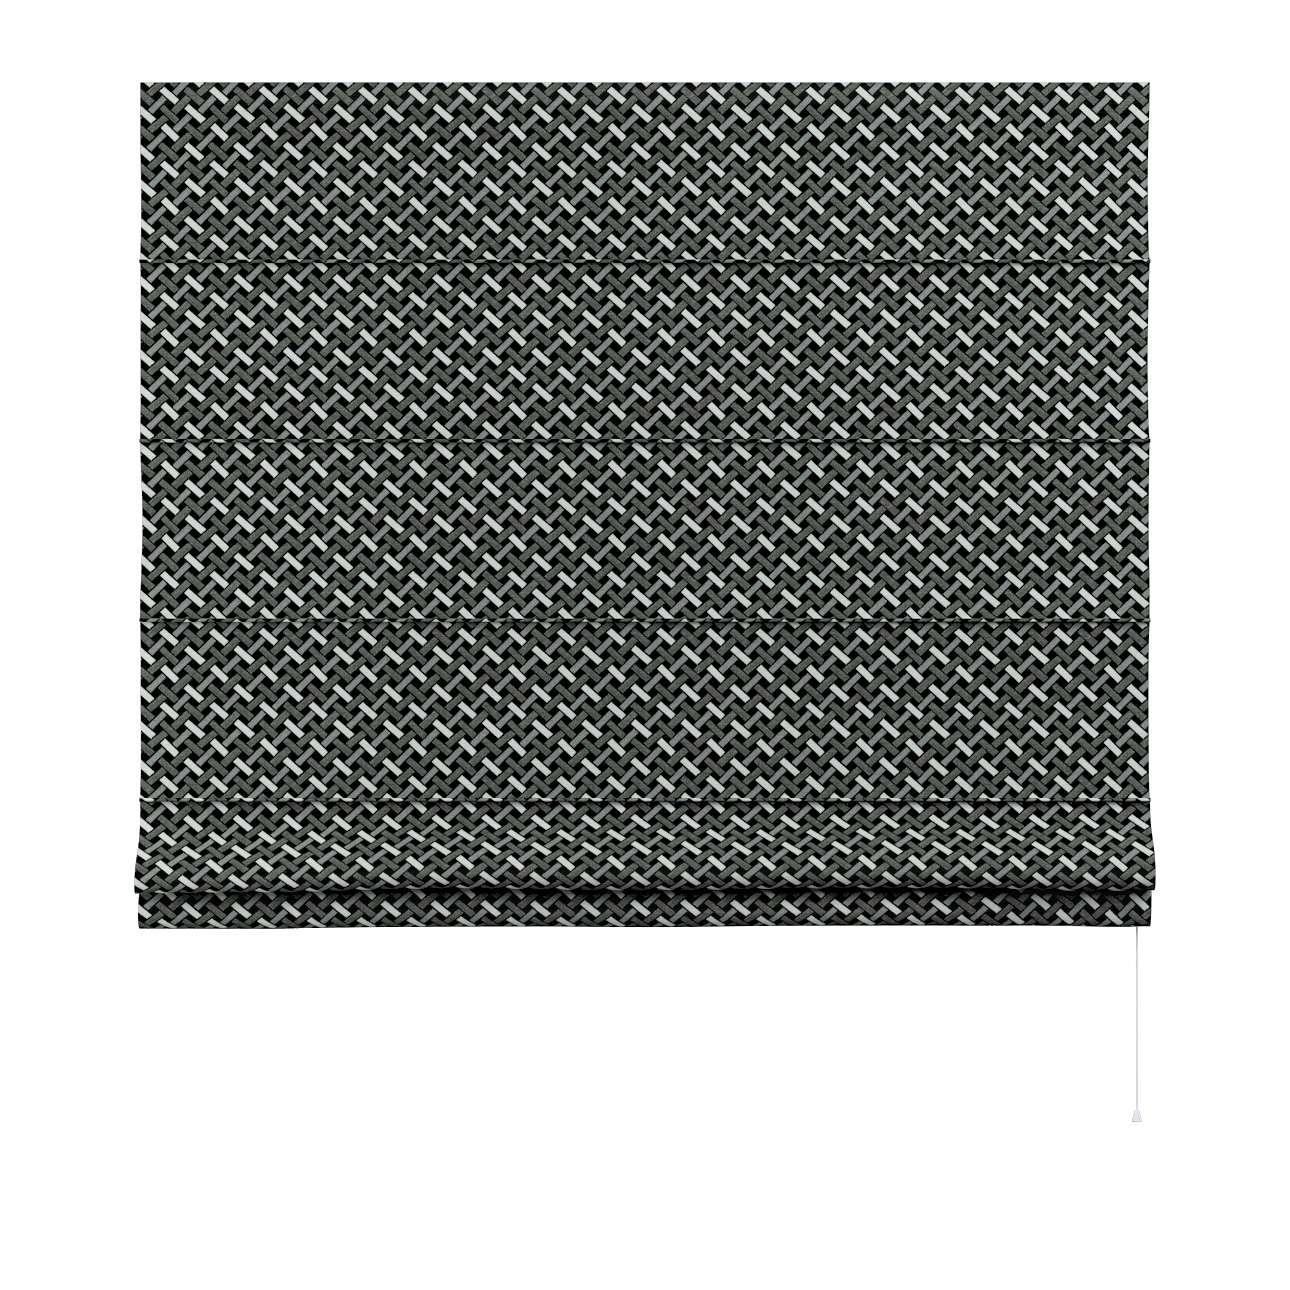 Roleta rzymska Capri w kolekcji Black & White, tkanina: 142-87